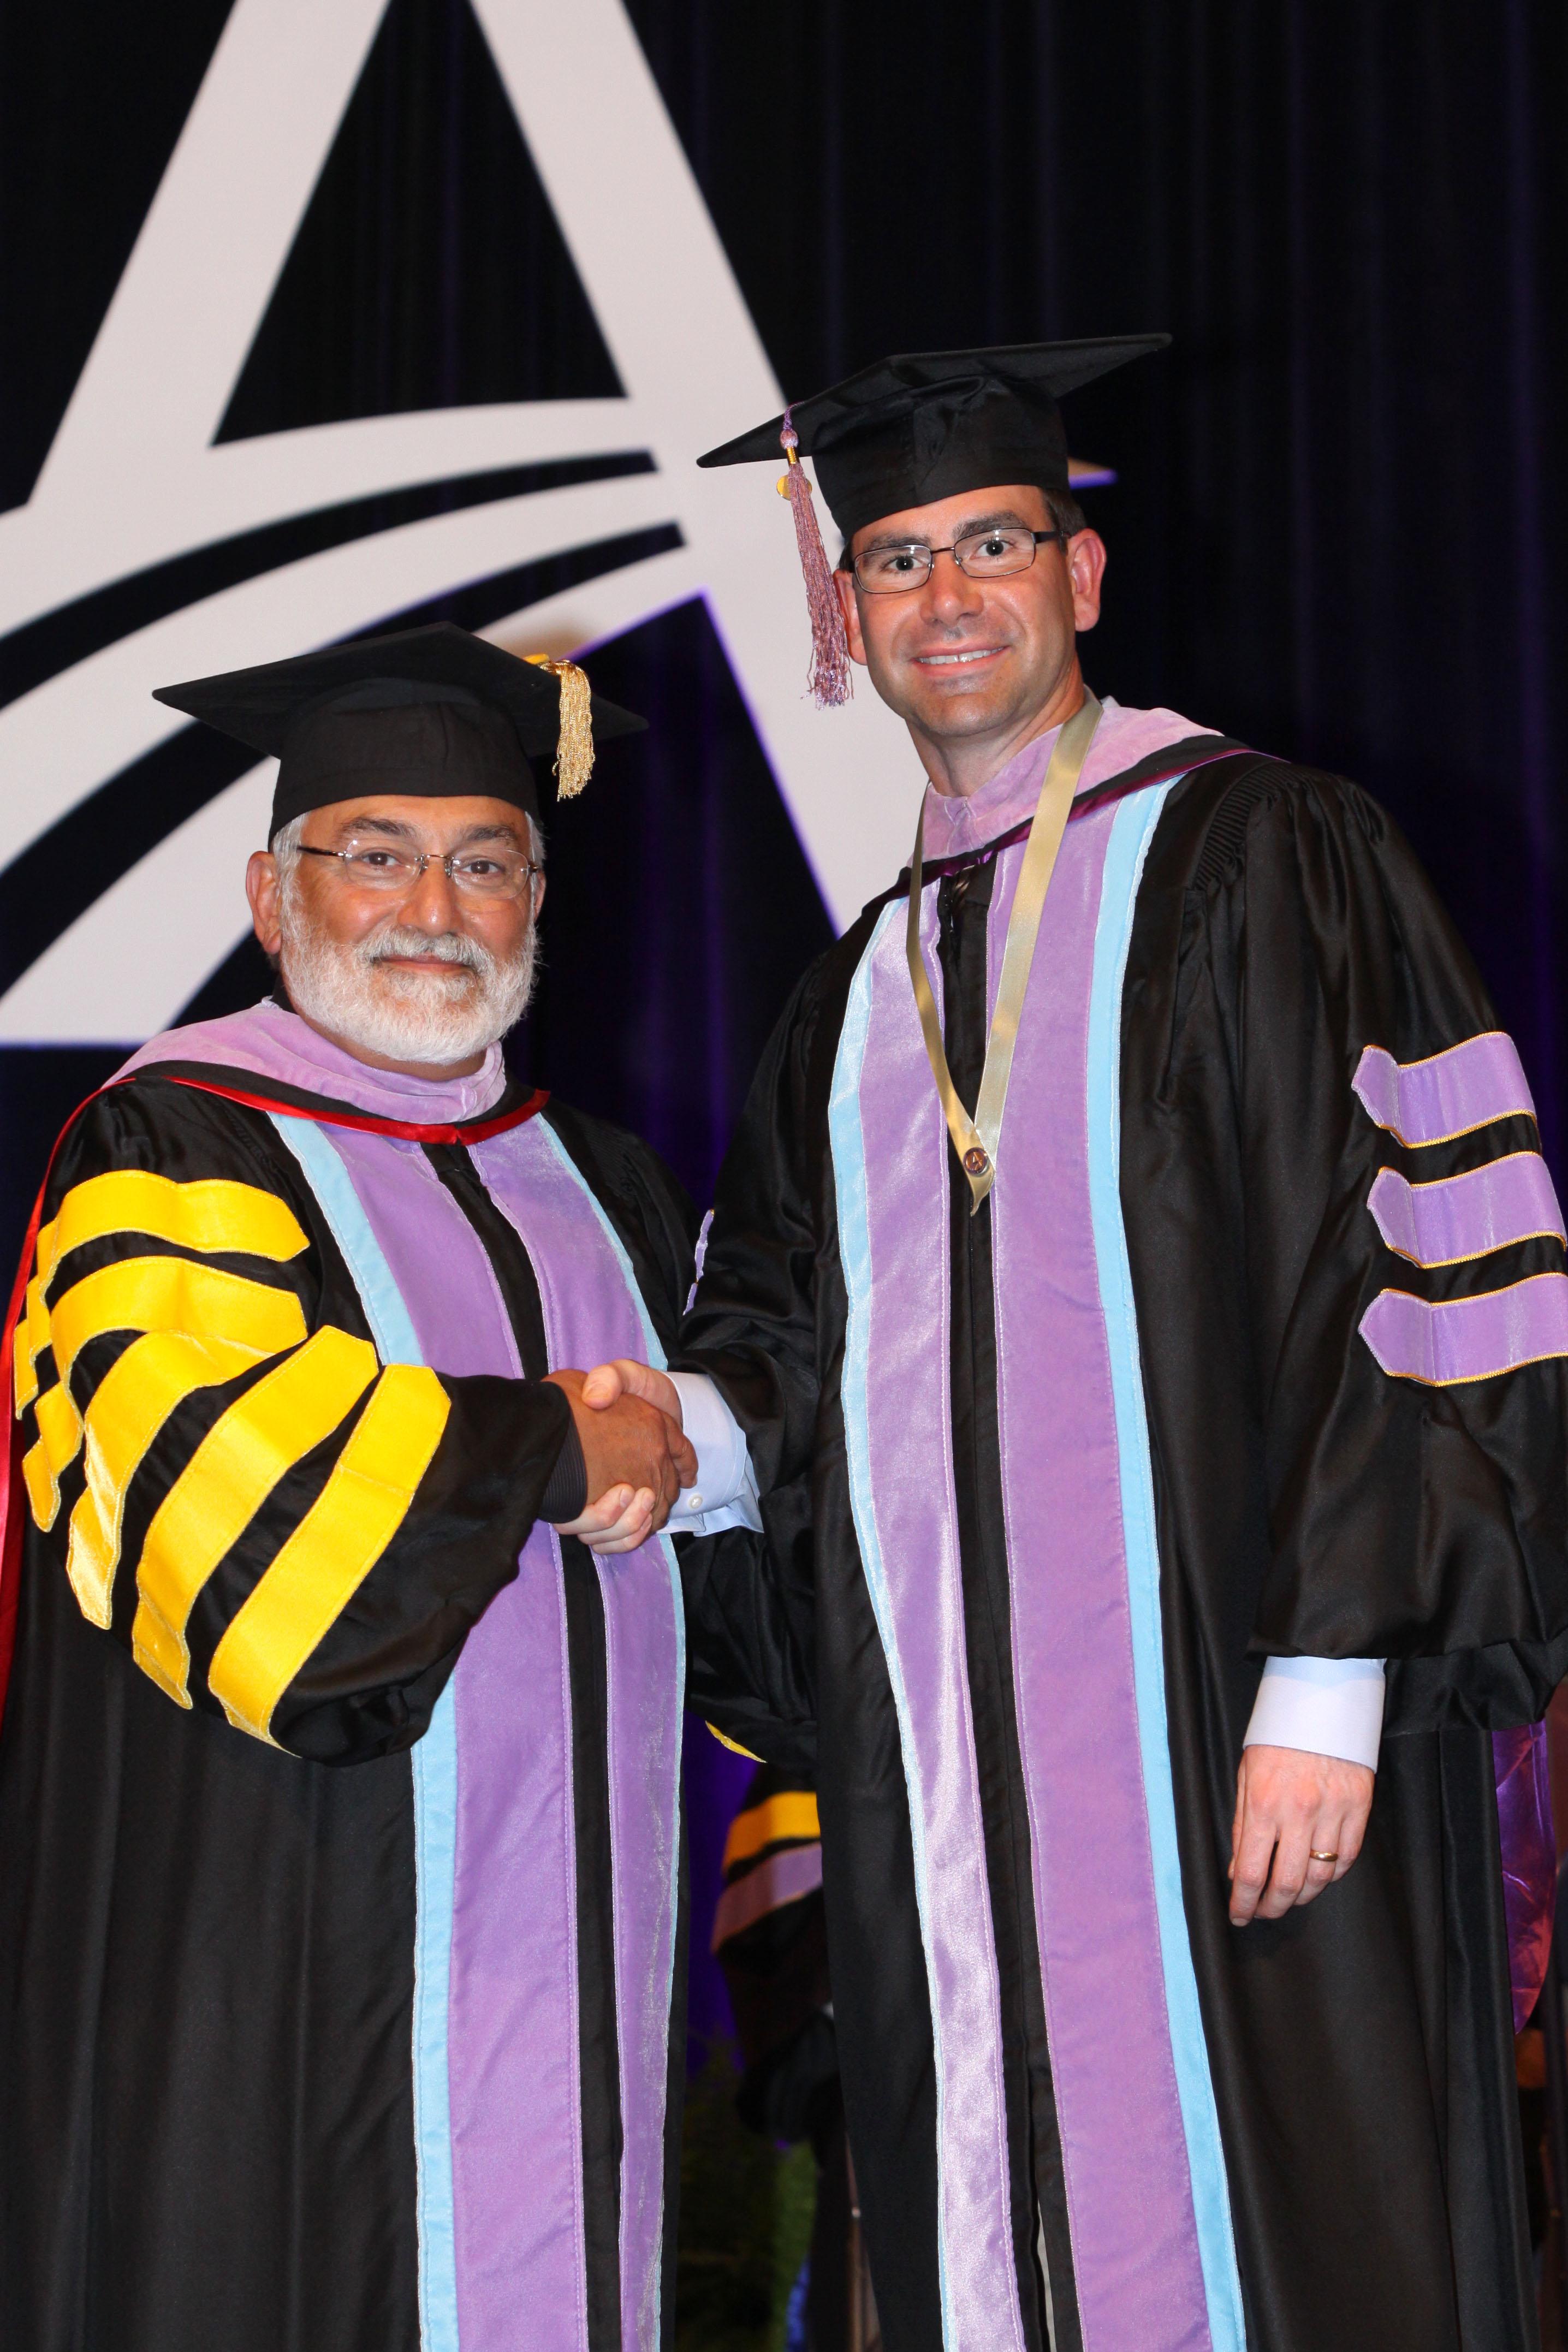 Dr. Carl Youngquist receiving the Fellowship award.